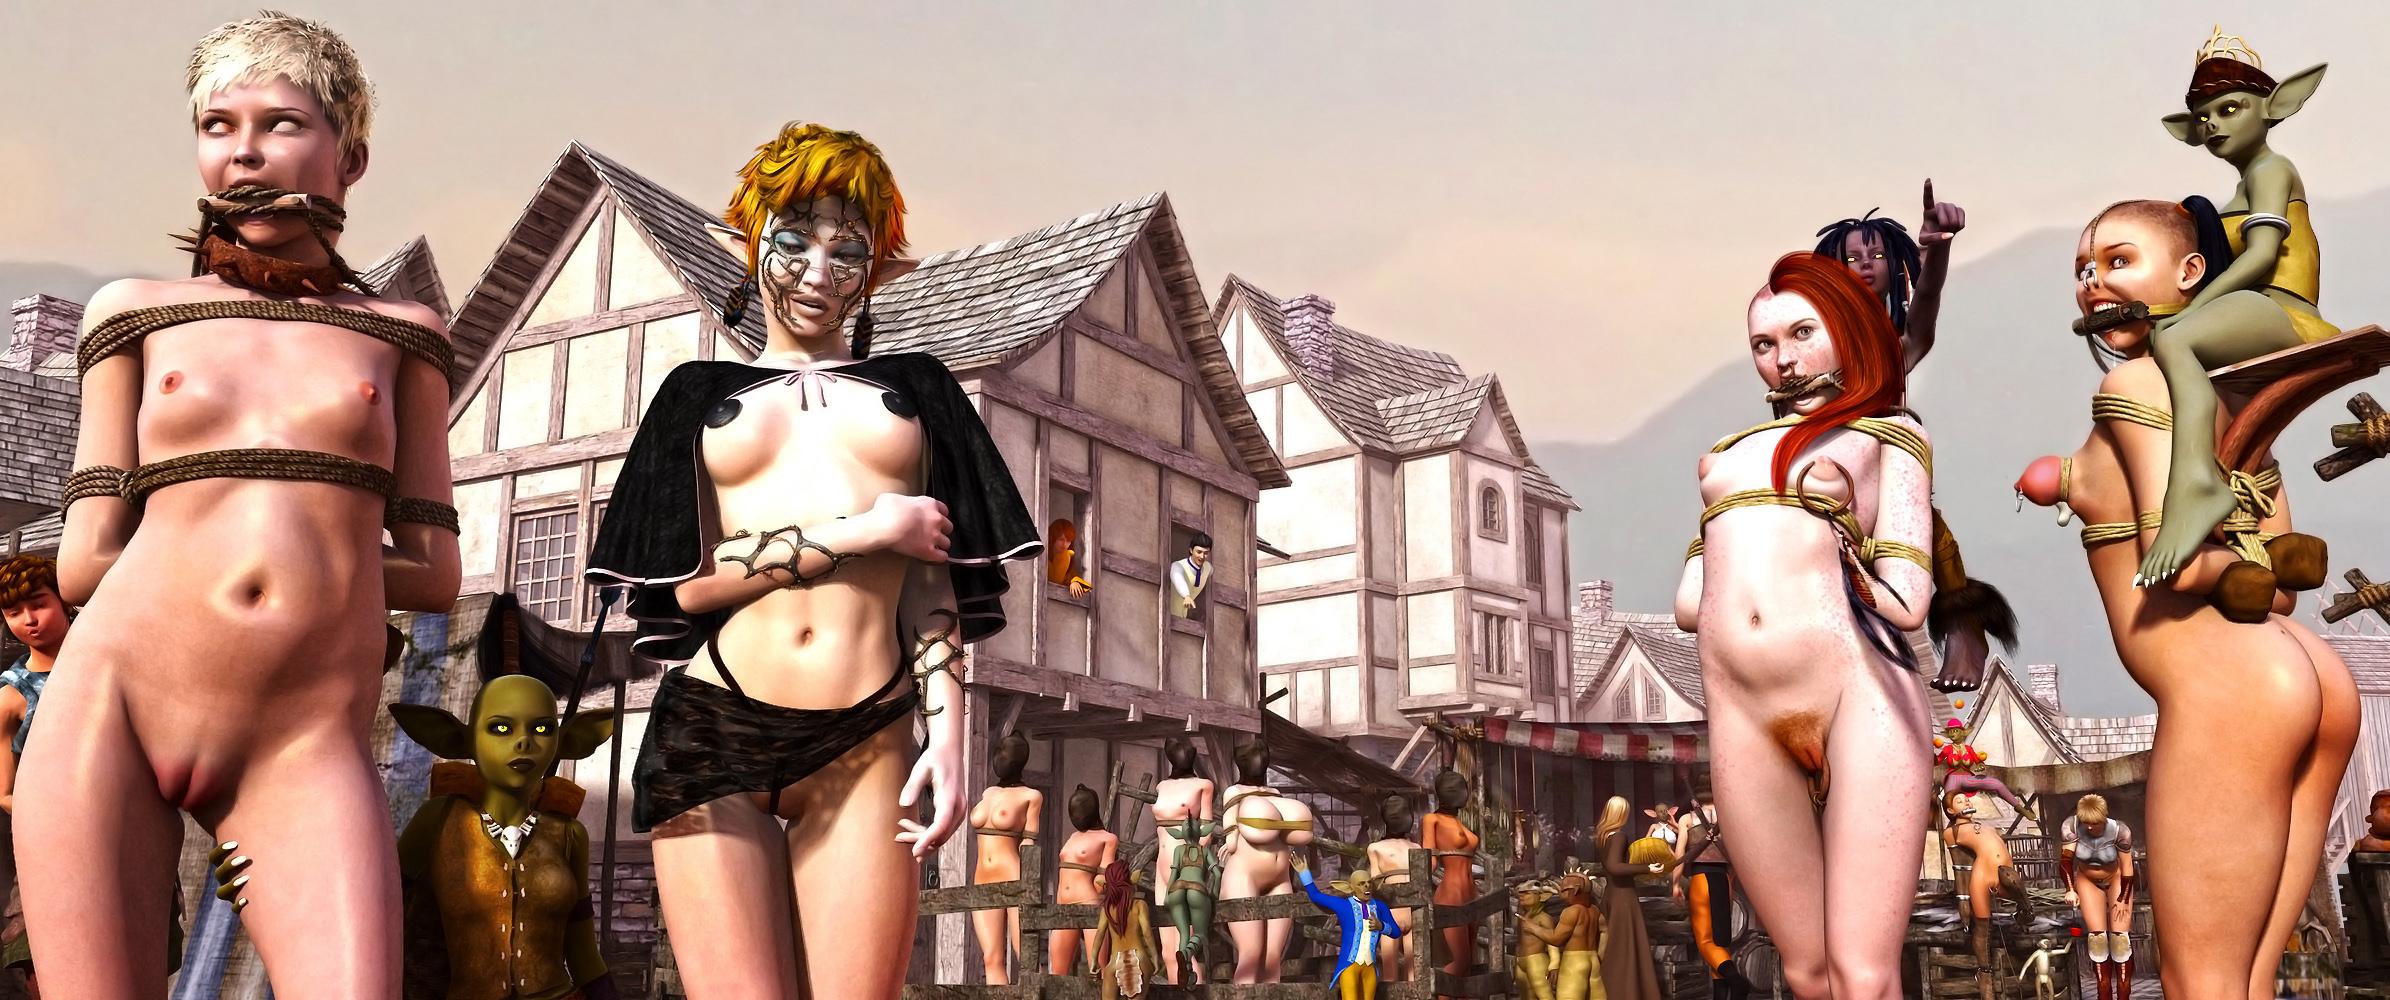 Goblin trade andelven slave porn porn videos